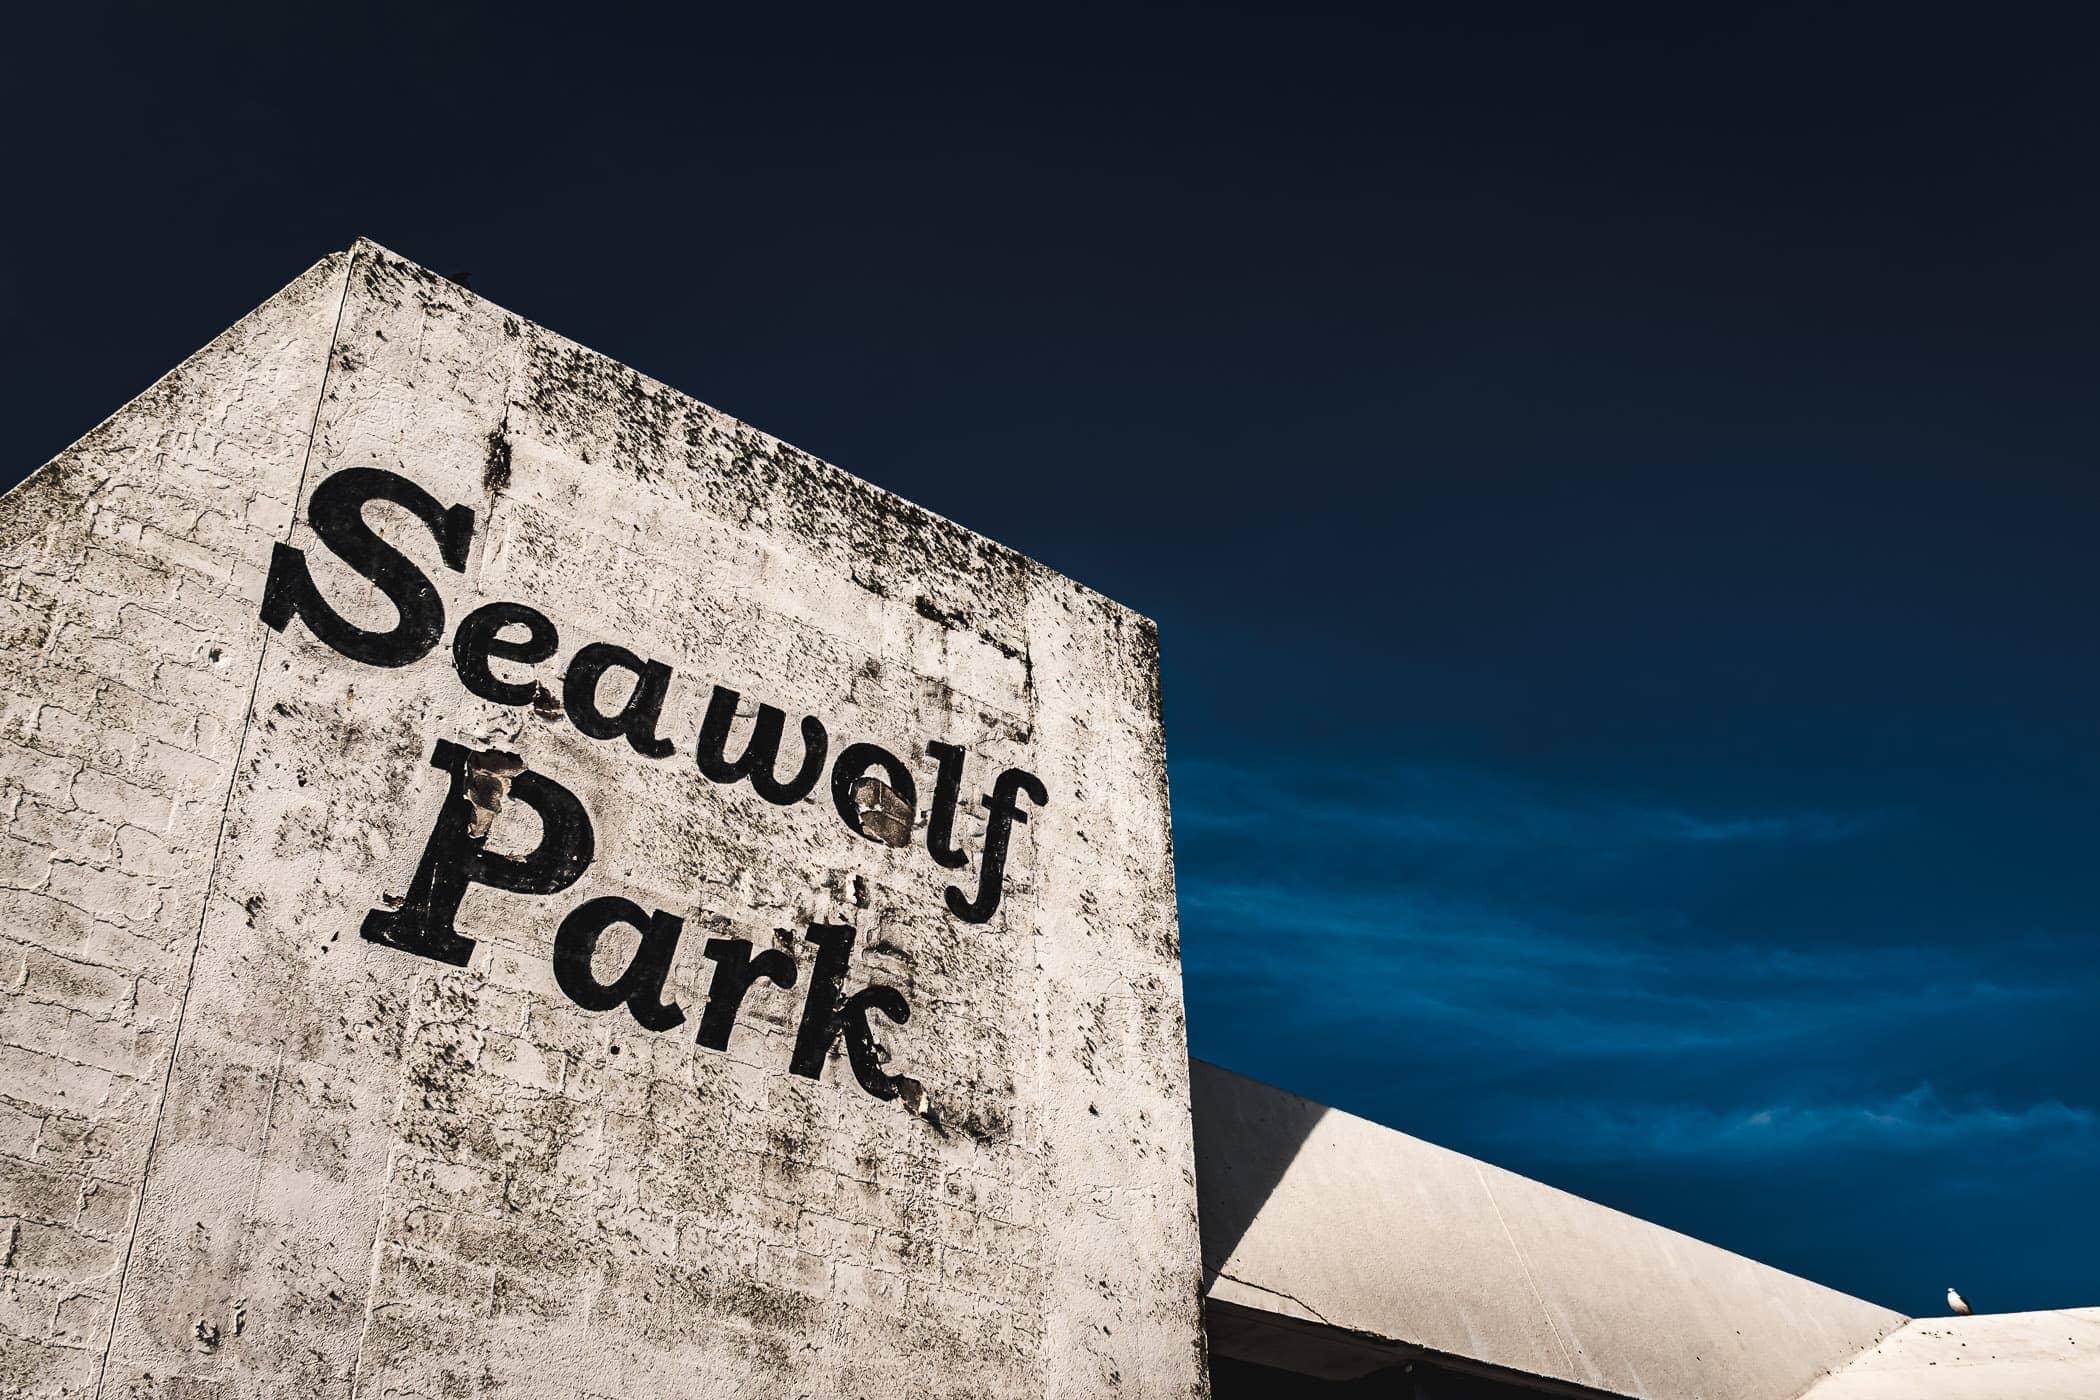 The abandoned, hurricane-damaged pavilion at Seawolf Park, Pelican Island, Galveston, Texas.